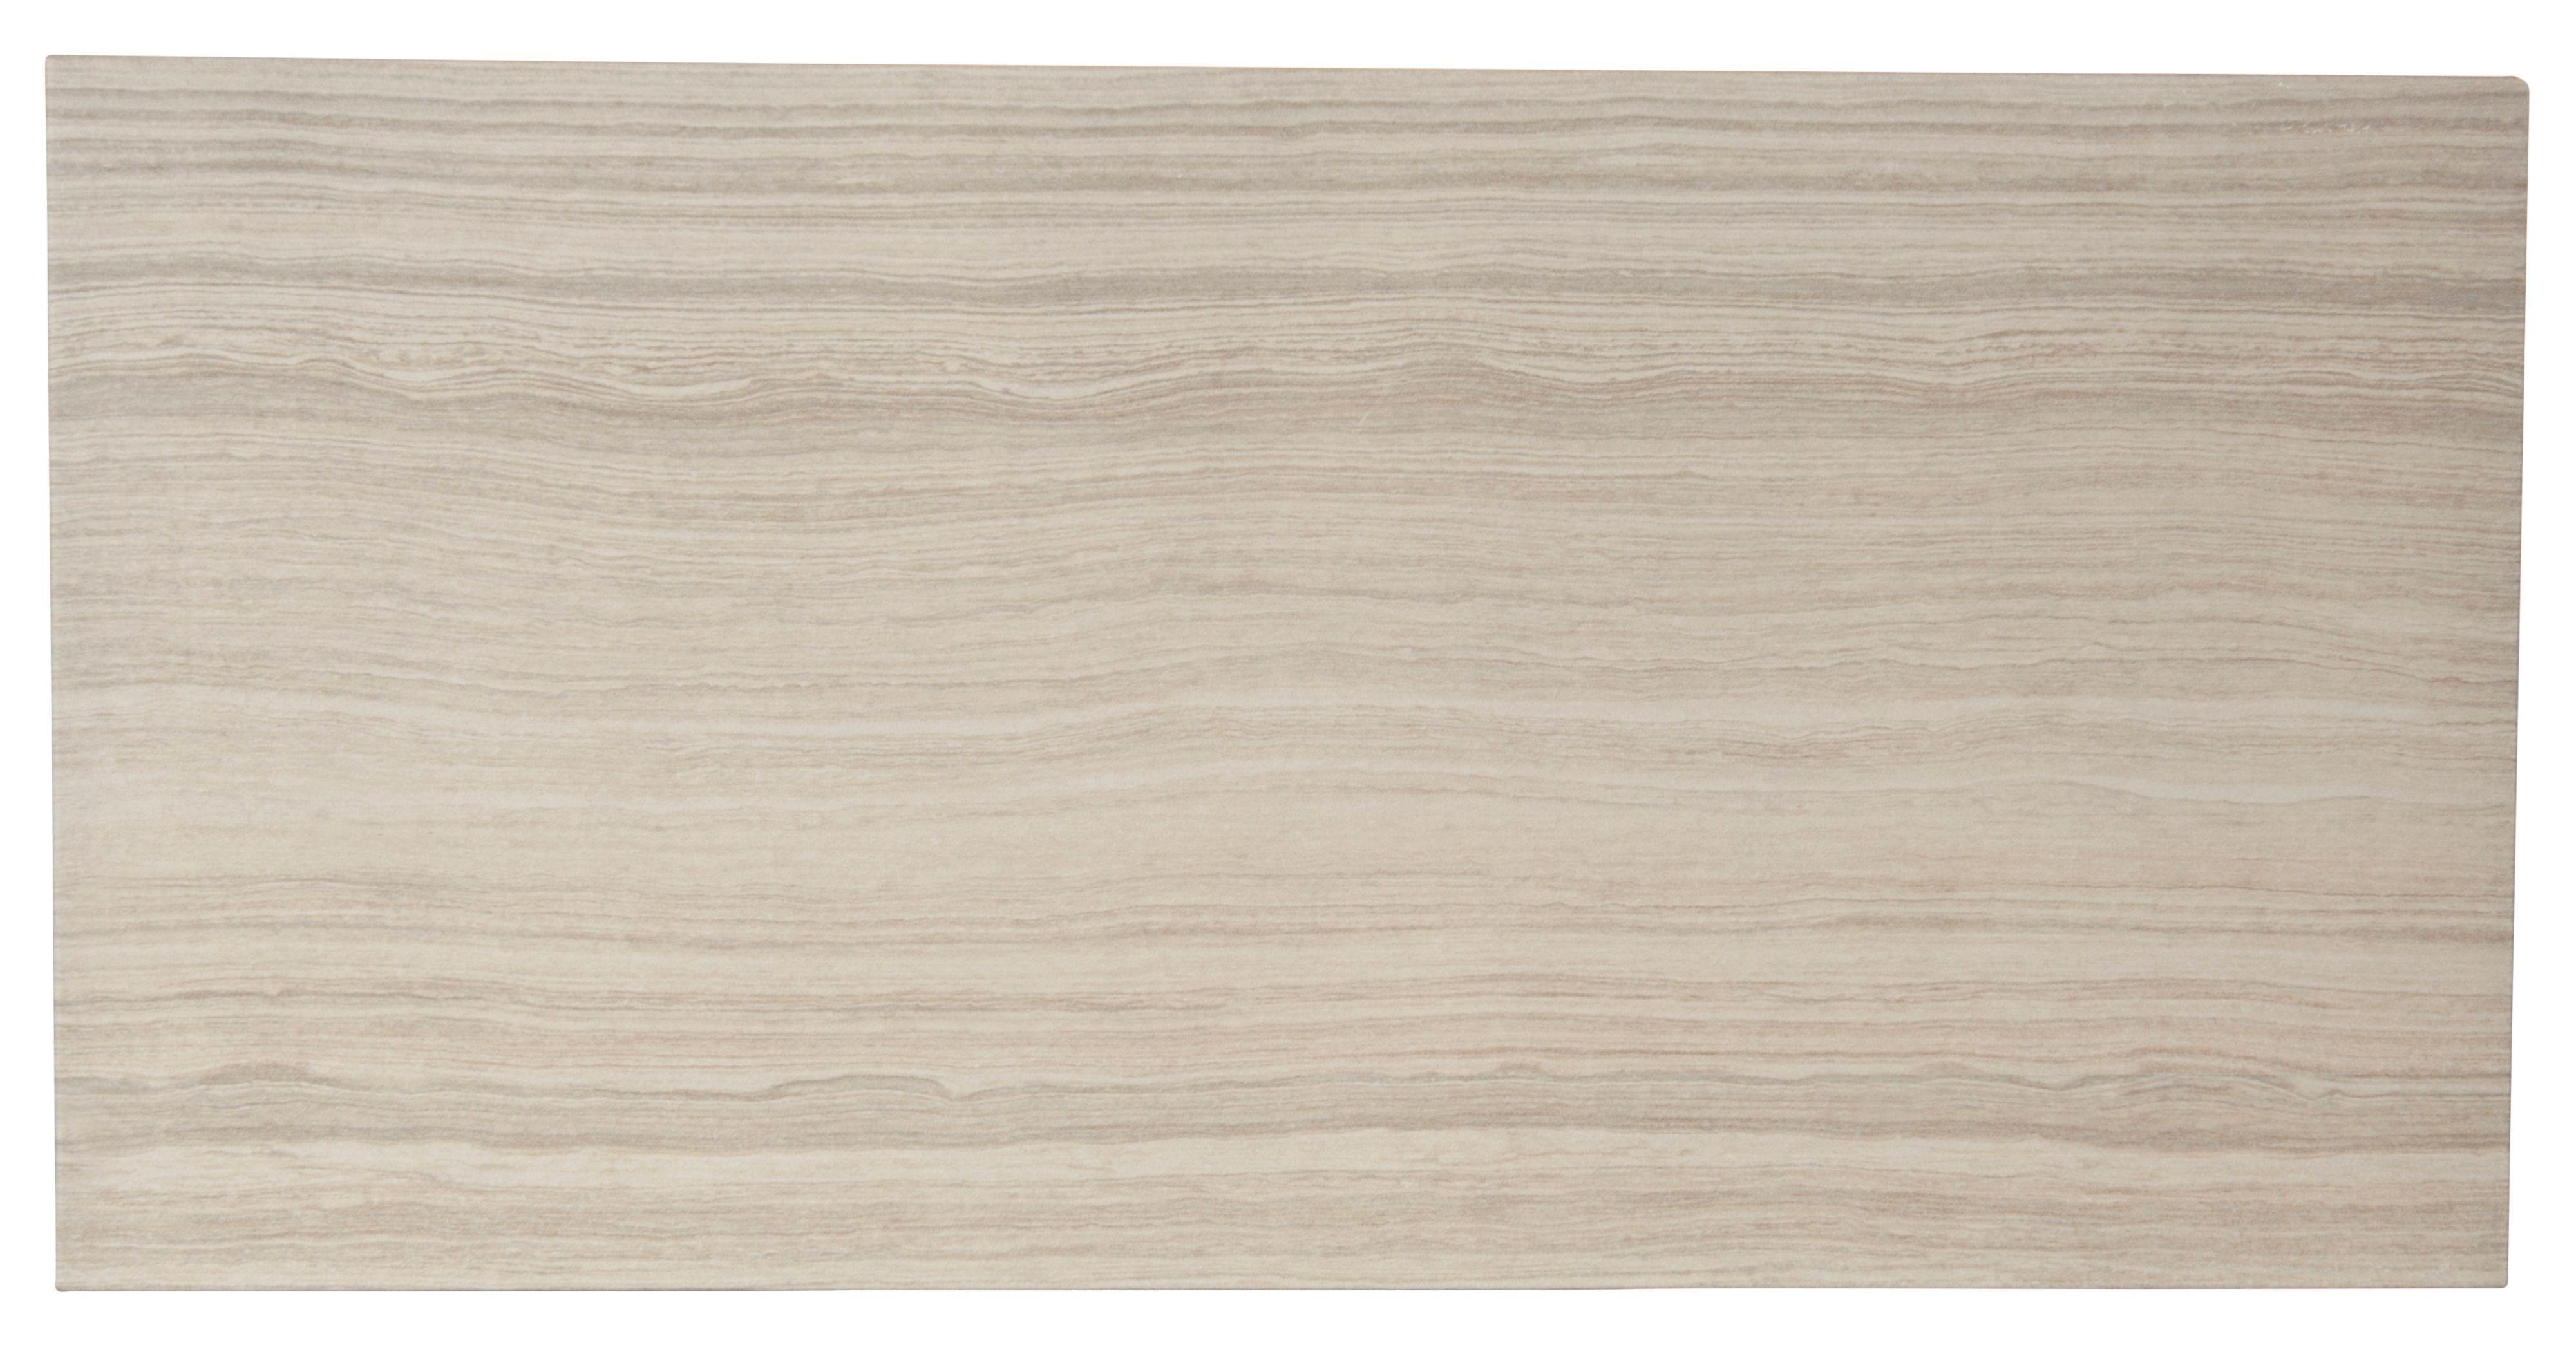 Bolina bone wood effect porcelain wall floor tile pack of 6 l bolina bone wood effect porcelain wall floor tile pack of 6 l600mm w300mm departments diy at bq dailygadgetfo Gallery